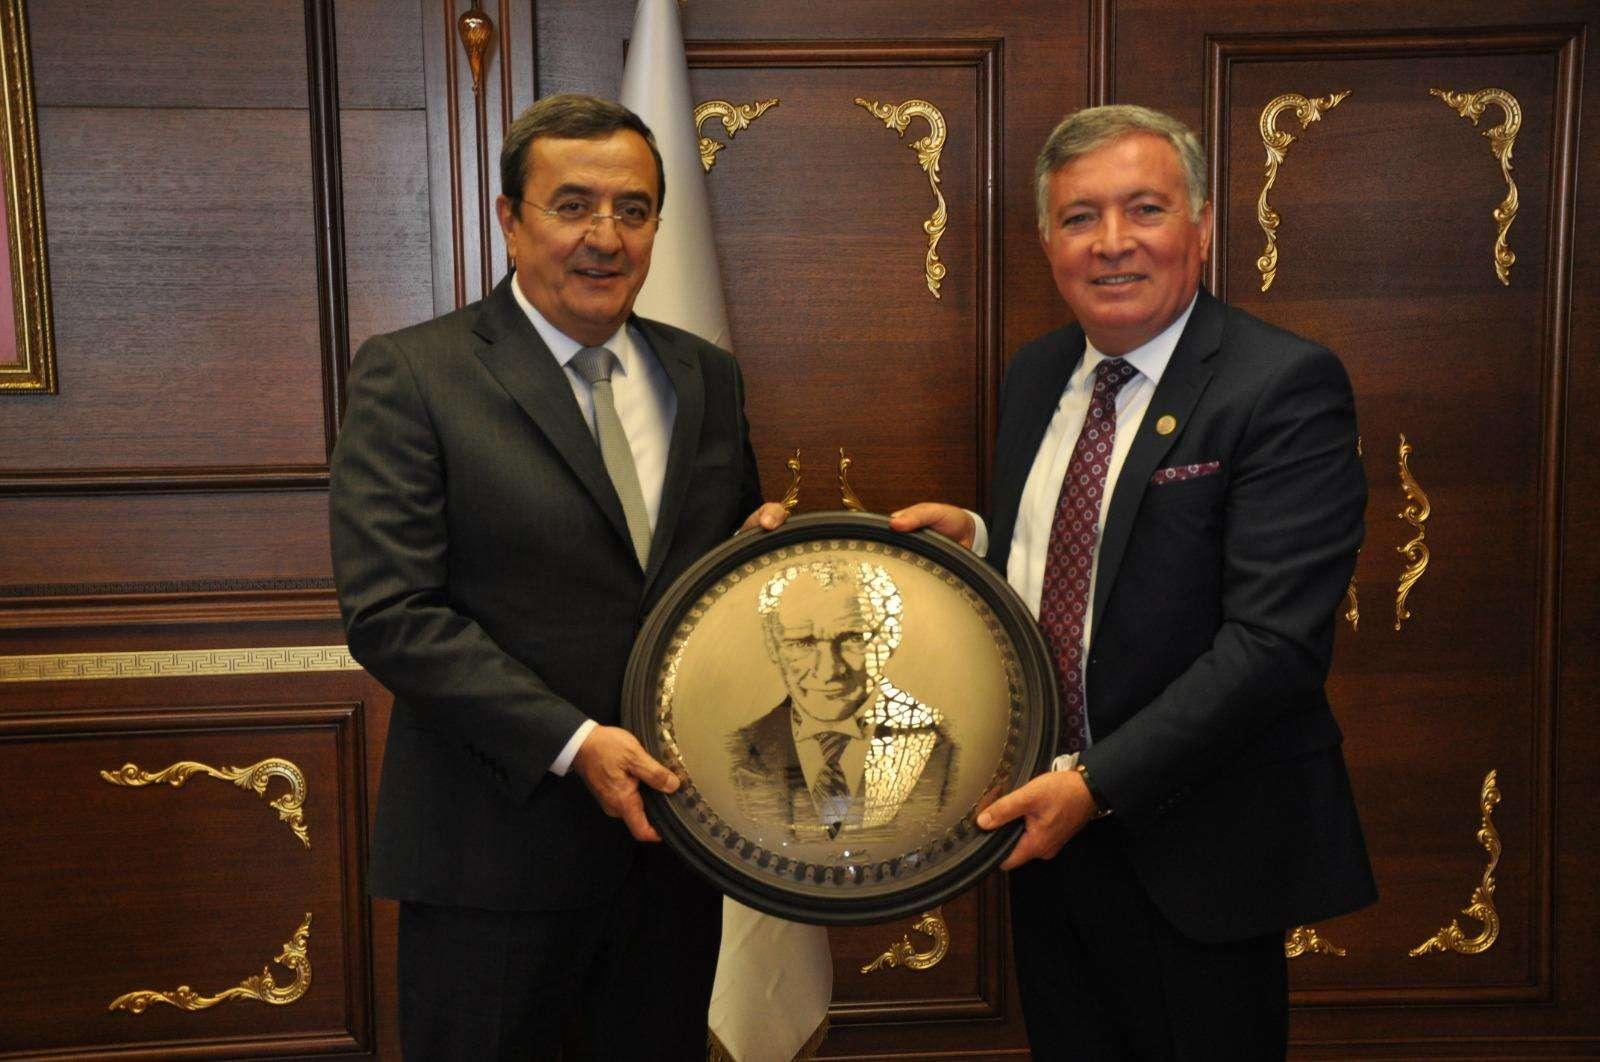 Konak'tan Kardeş Honaz'a ağabey desteği